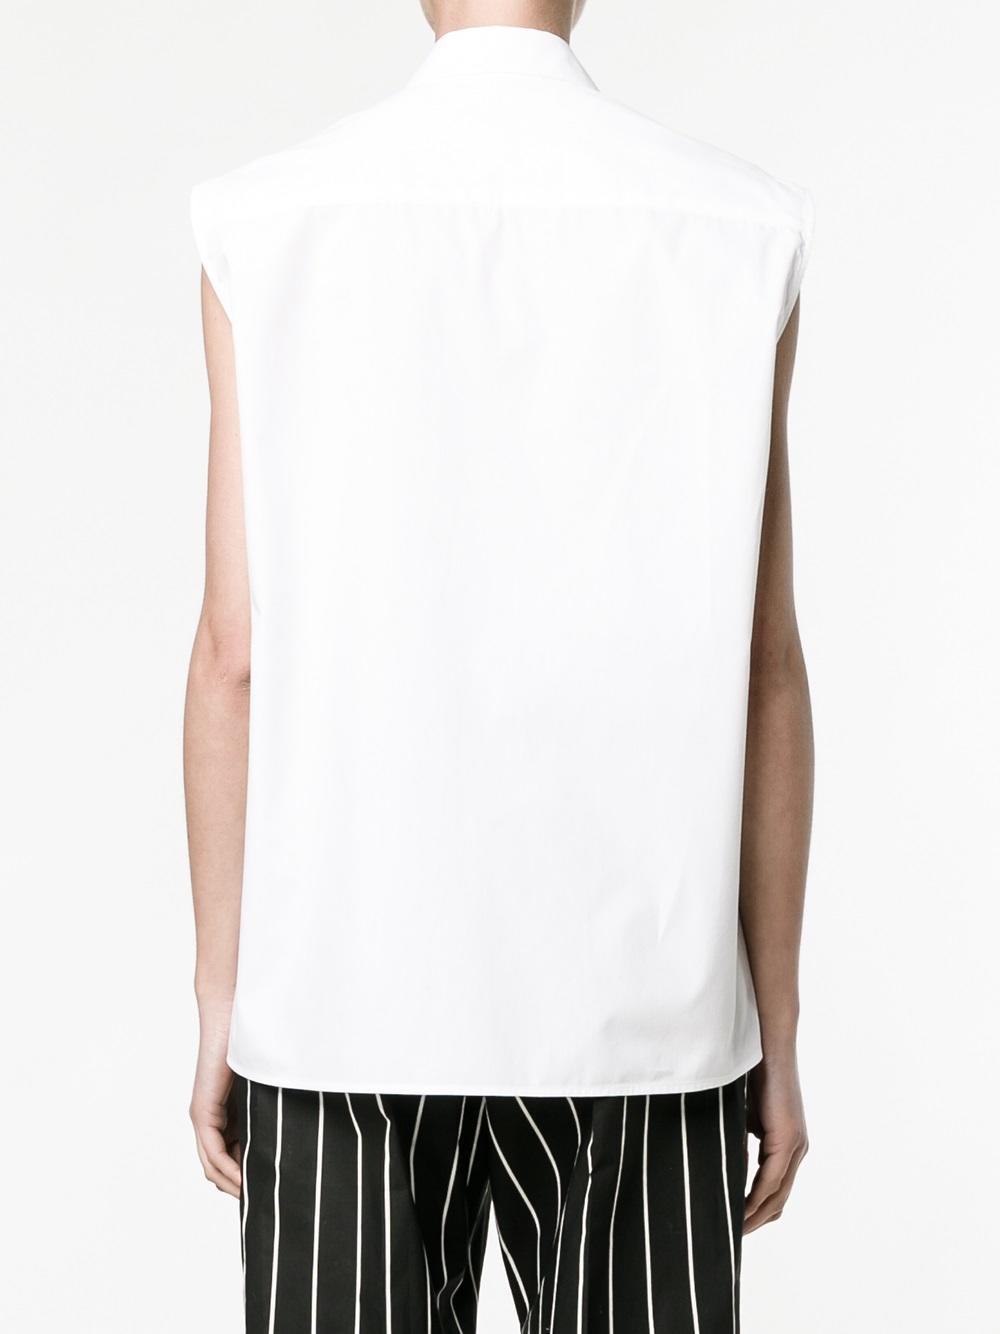 gingham pocket shirt - White Christopher Kane Manchester Great Sale Cheap Online 5Ac70d